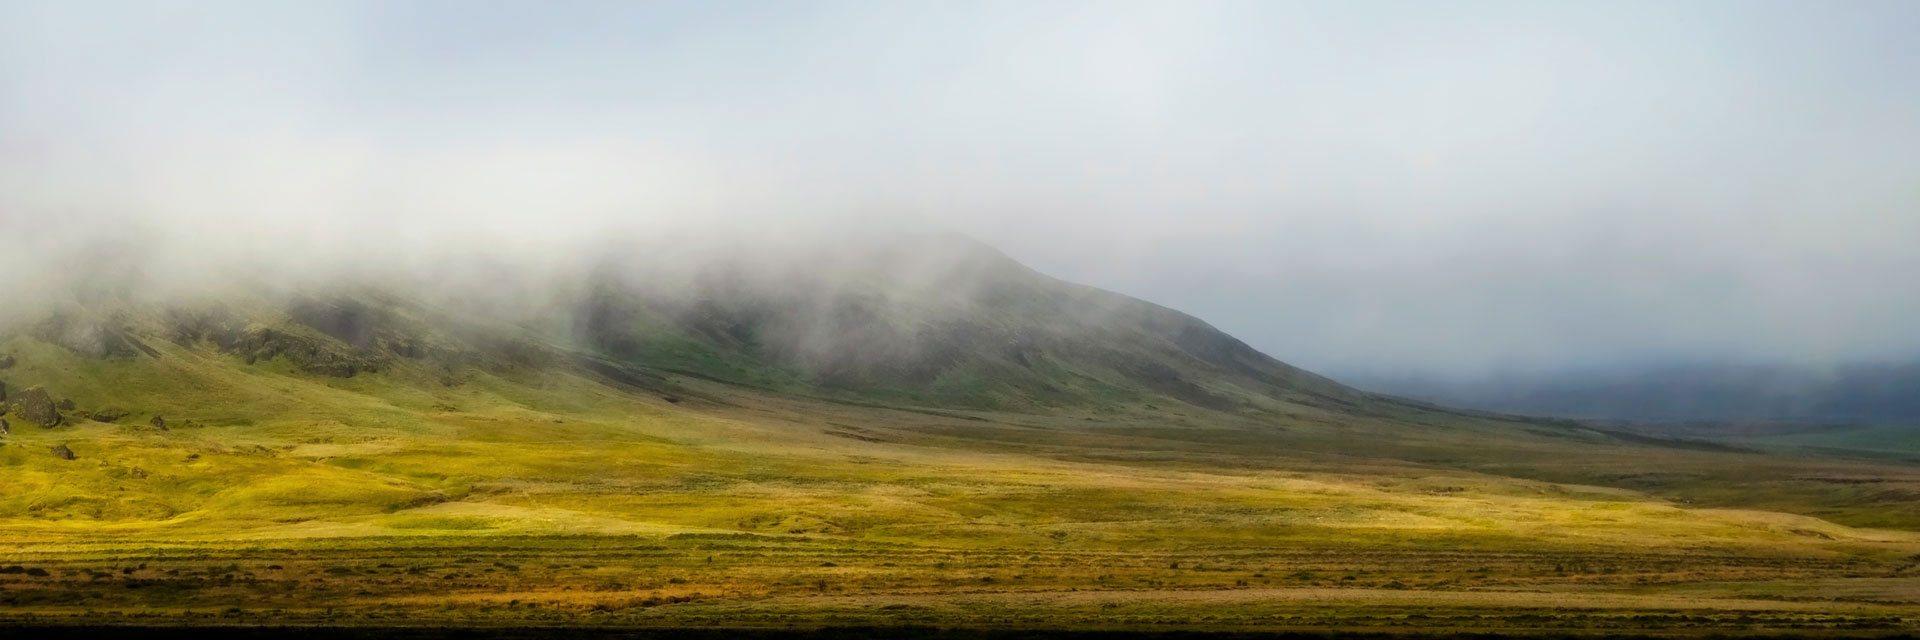 Thomas Menk Iceland